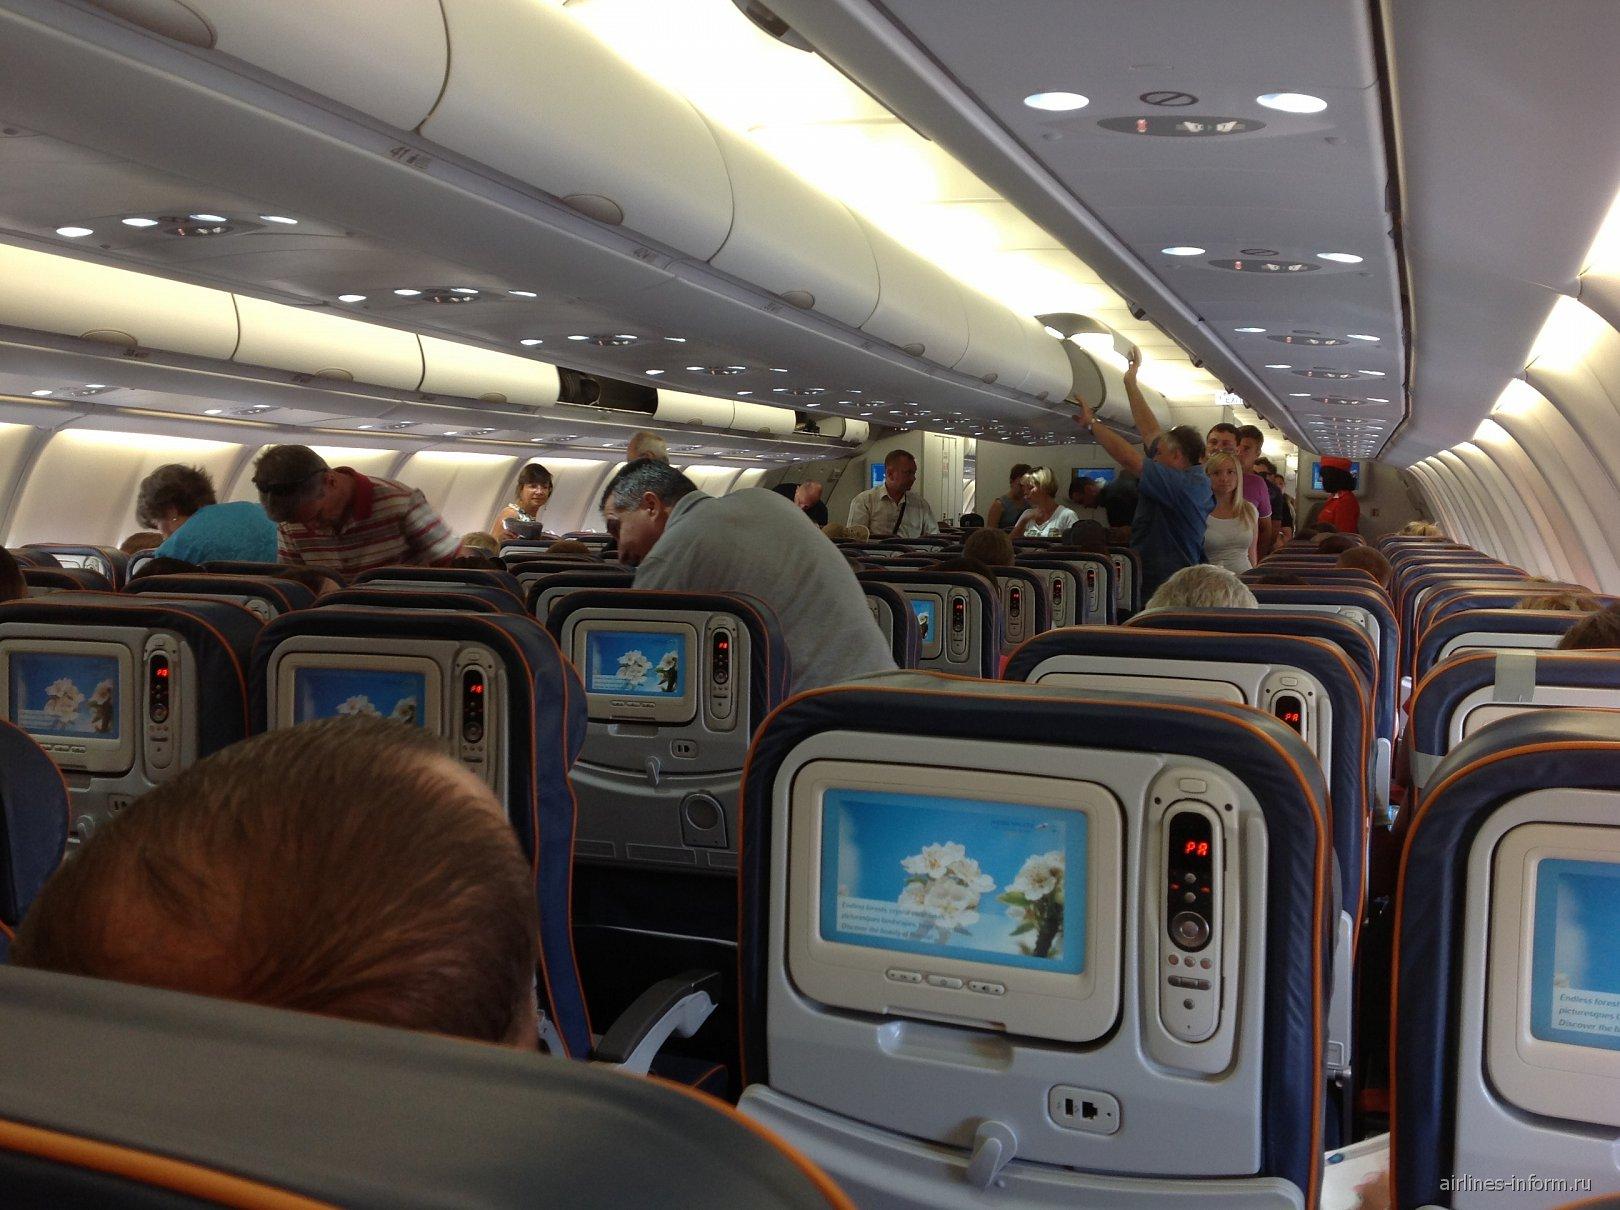 Пассажирский салон самолета Airbus A330-300 Аэрофлота